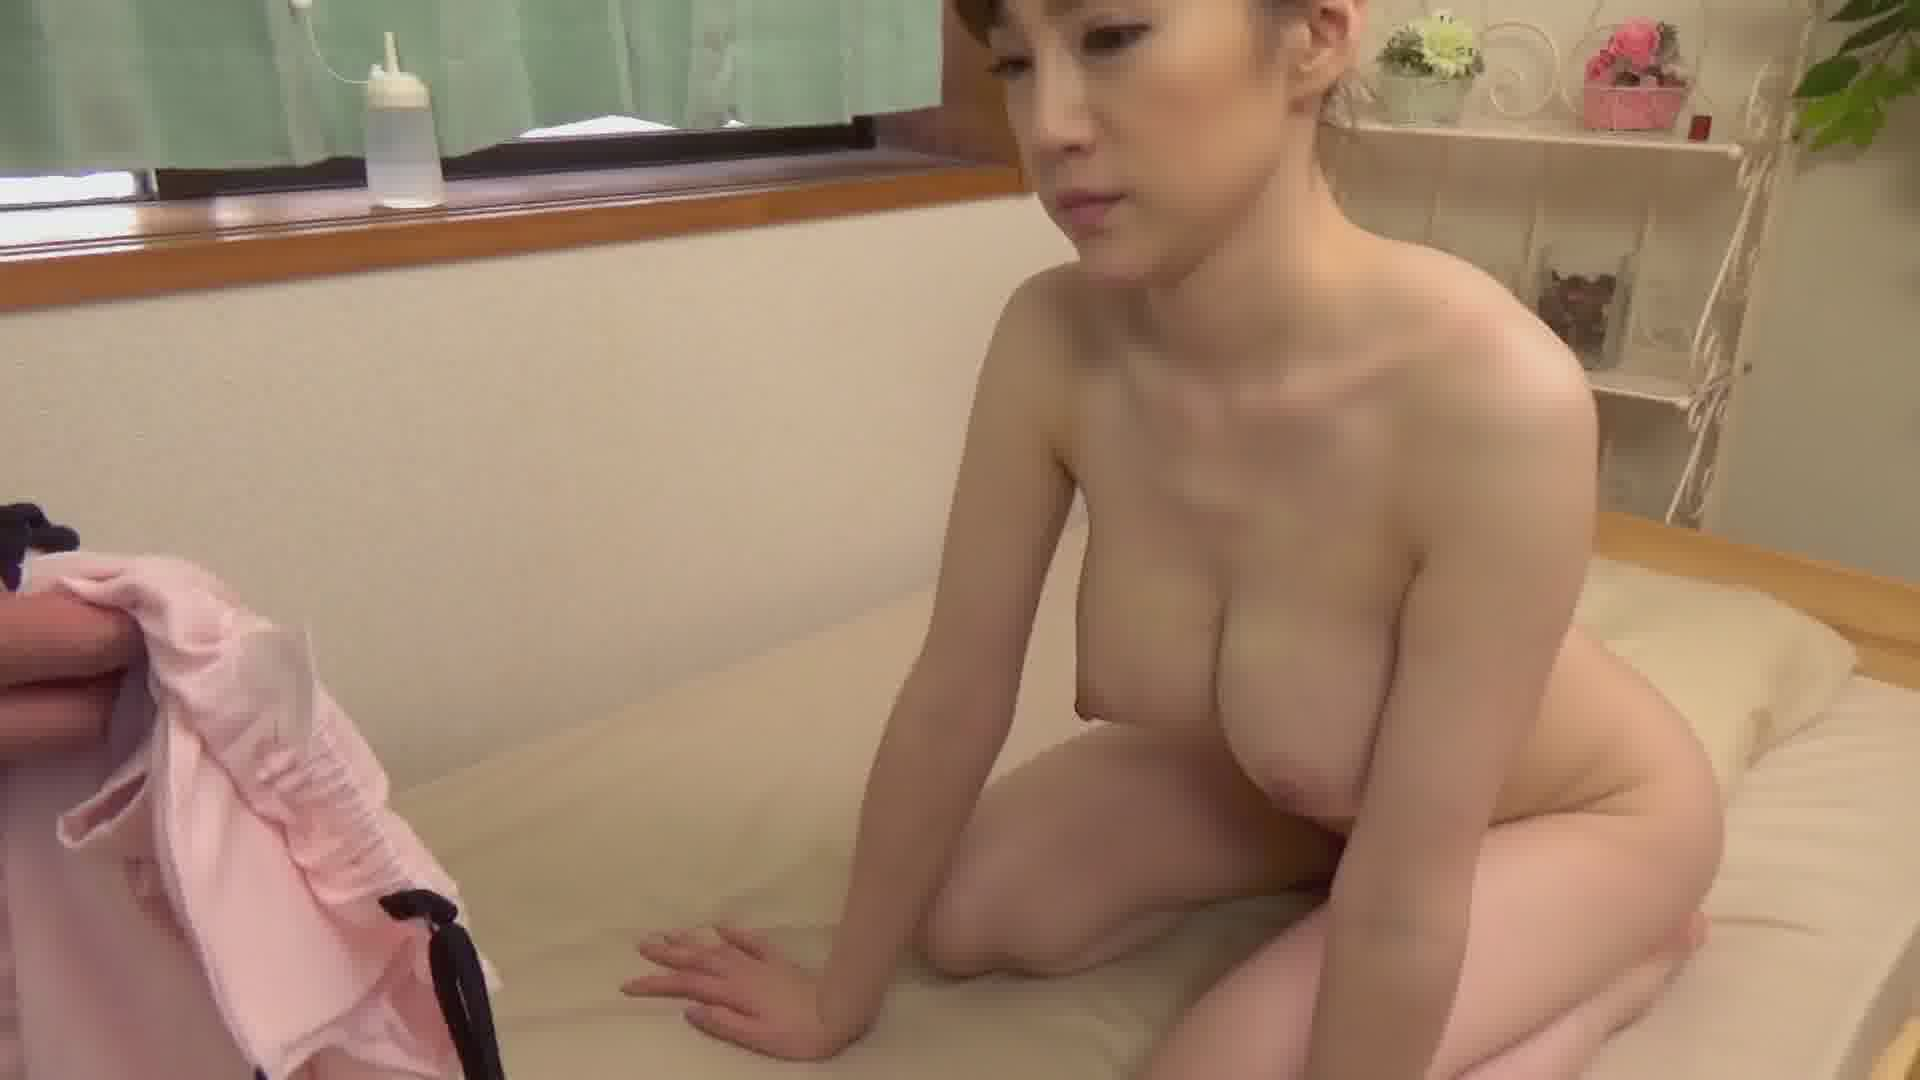 Icupの絶品ボディが媚薬漬け - すみれ美香【巨乳・クンニ・中出し】